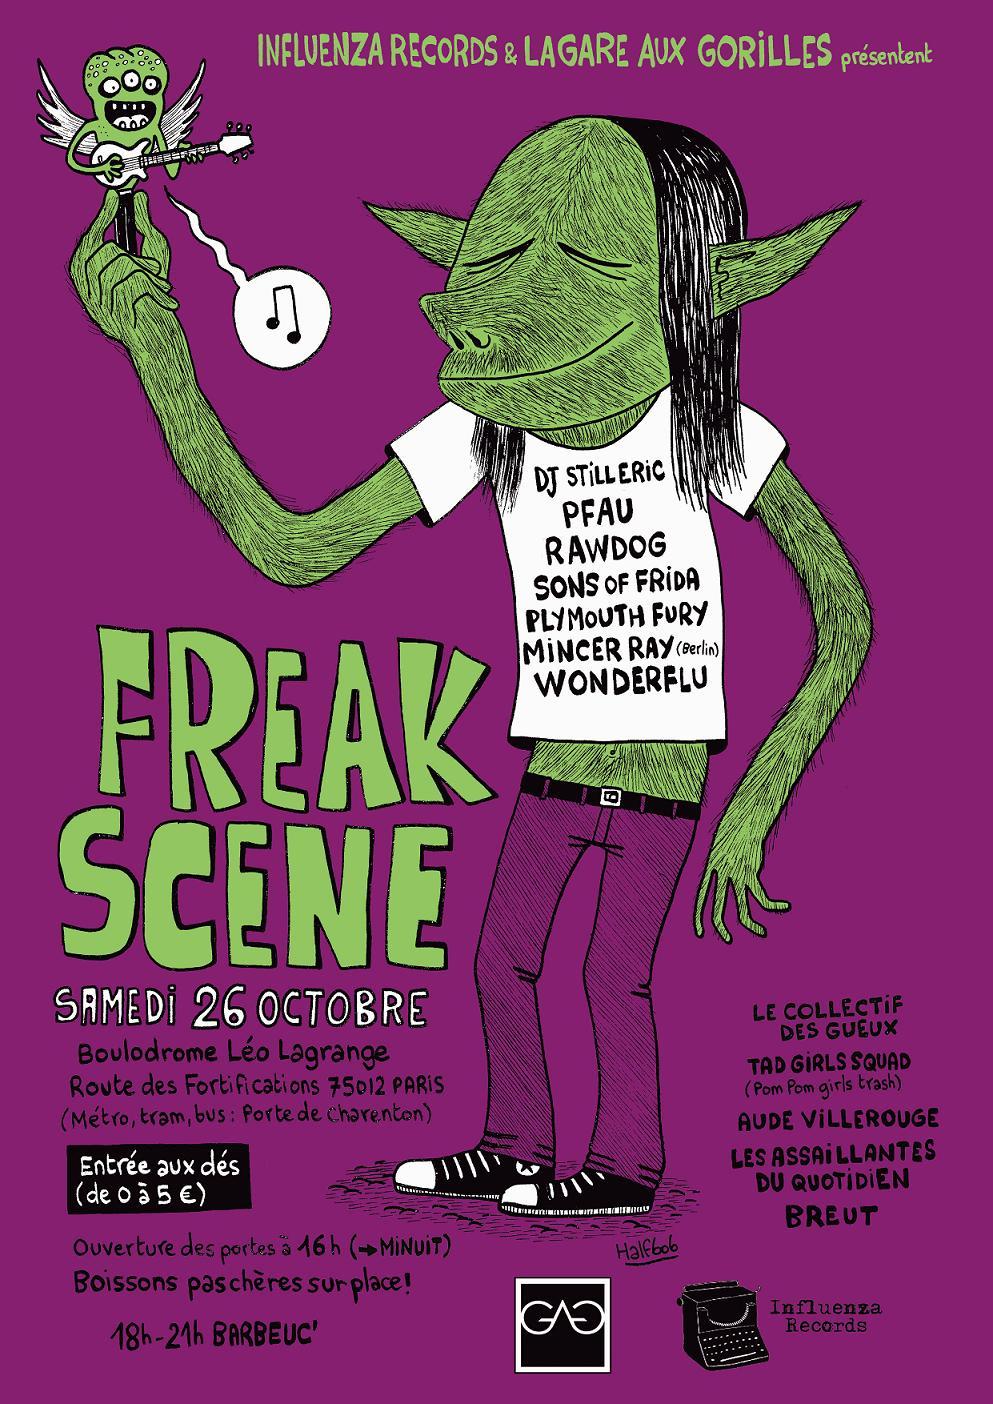 http://www.influenza-records.com/wp-content/uploads/2013/09/Affiche-Freak-Scene-couleur.jpg